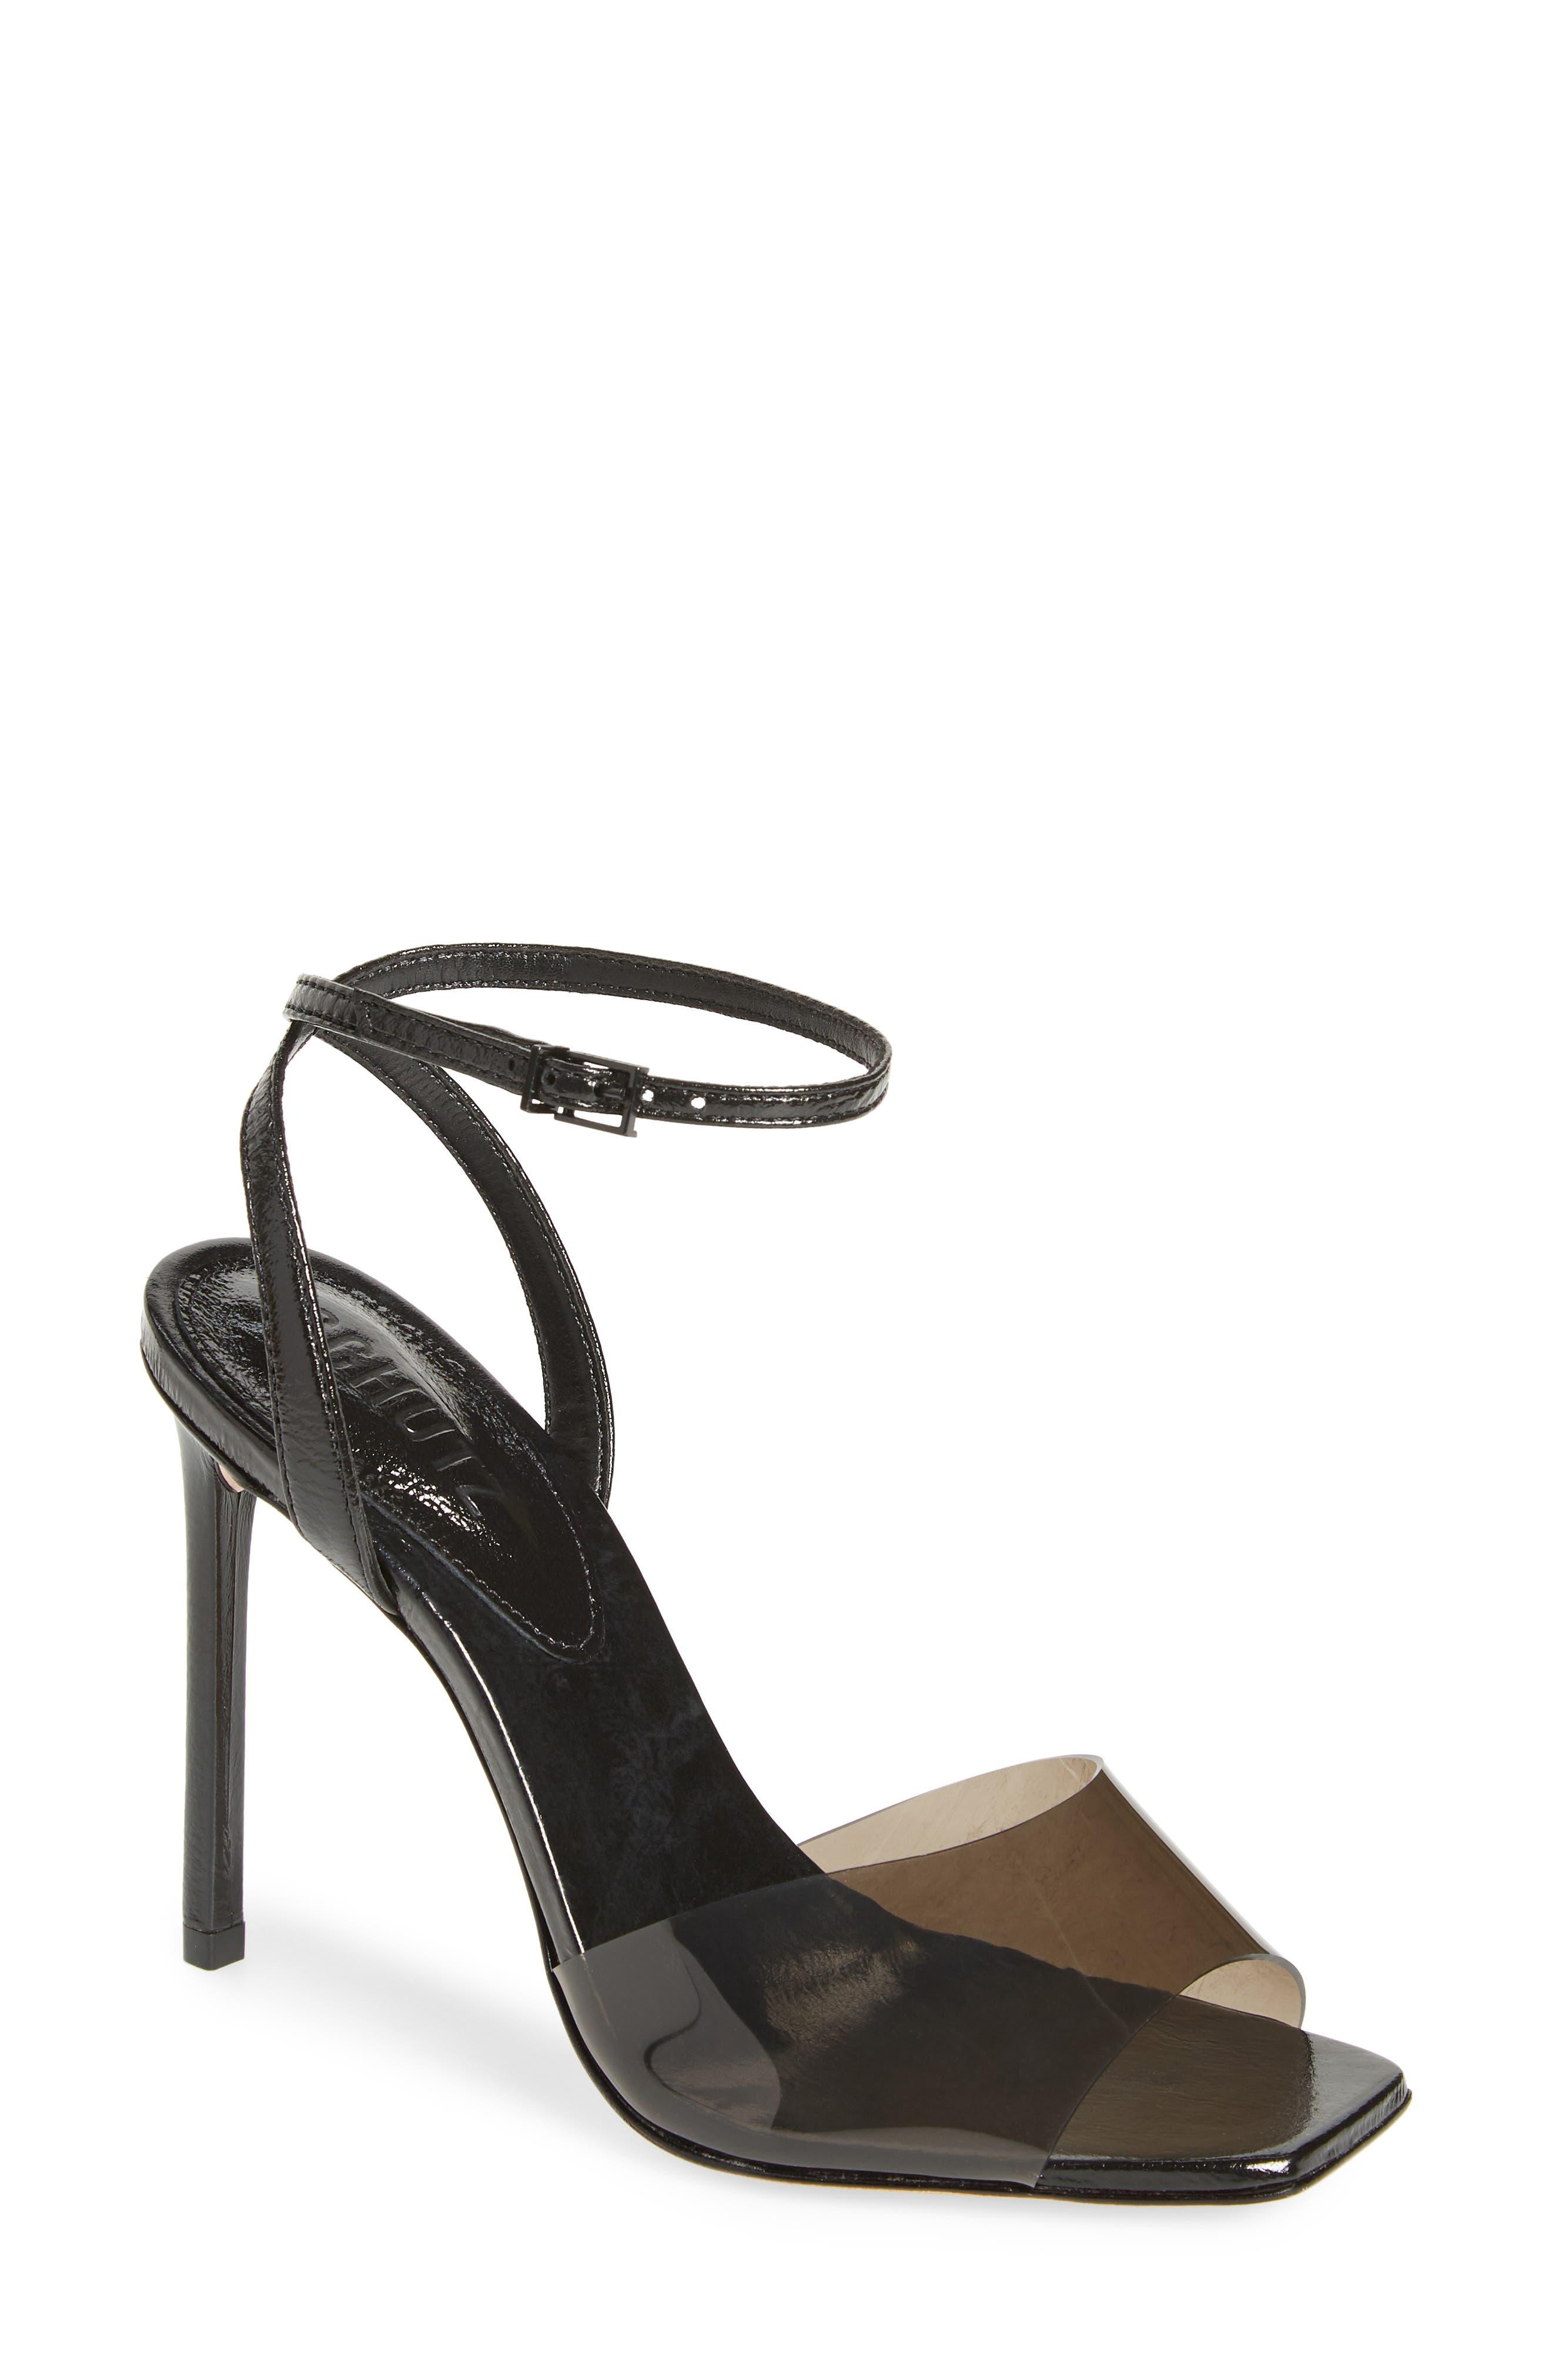 Schutz Slippers Jamili Clear Ankle Strap Sandal